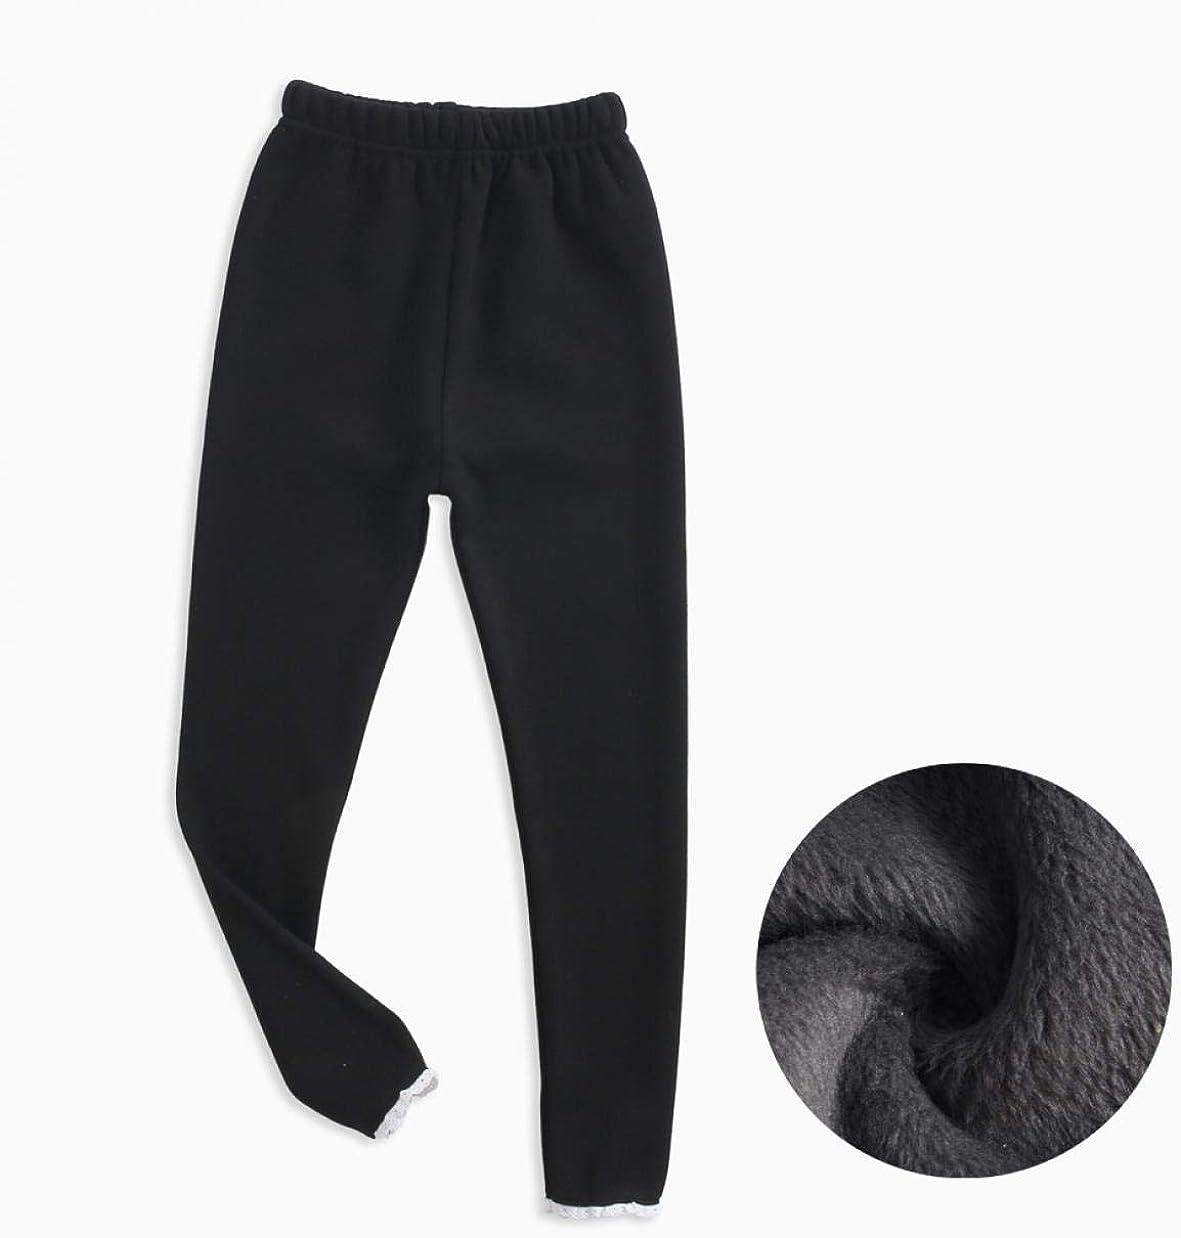 3-Pack WODISON pile ragazze Leggings base foderato pantaloni da jogging termici con ruches